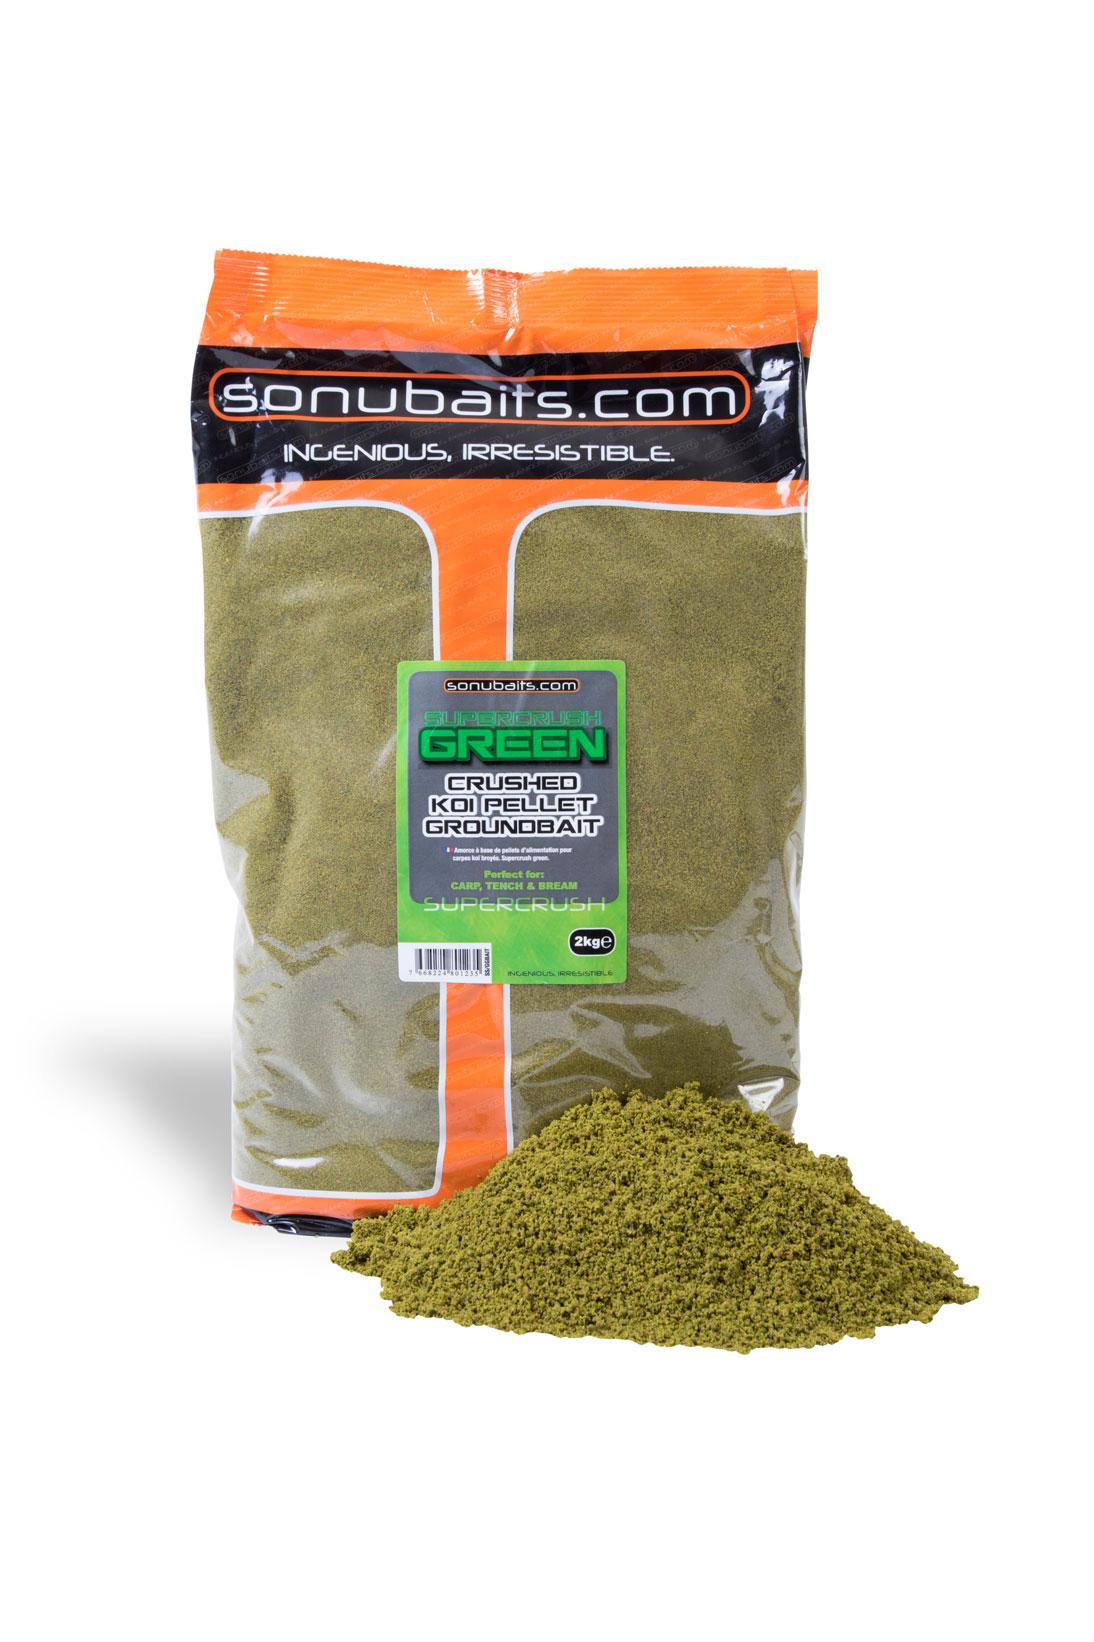 Supercrush green